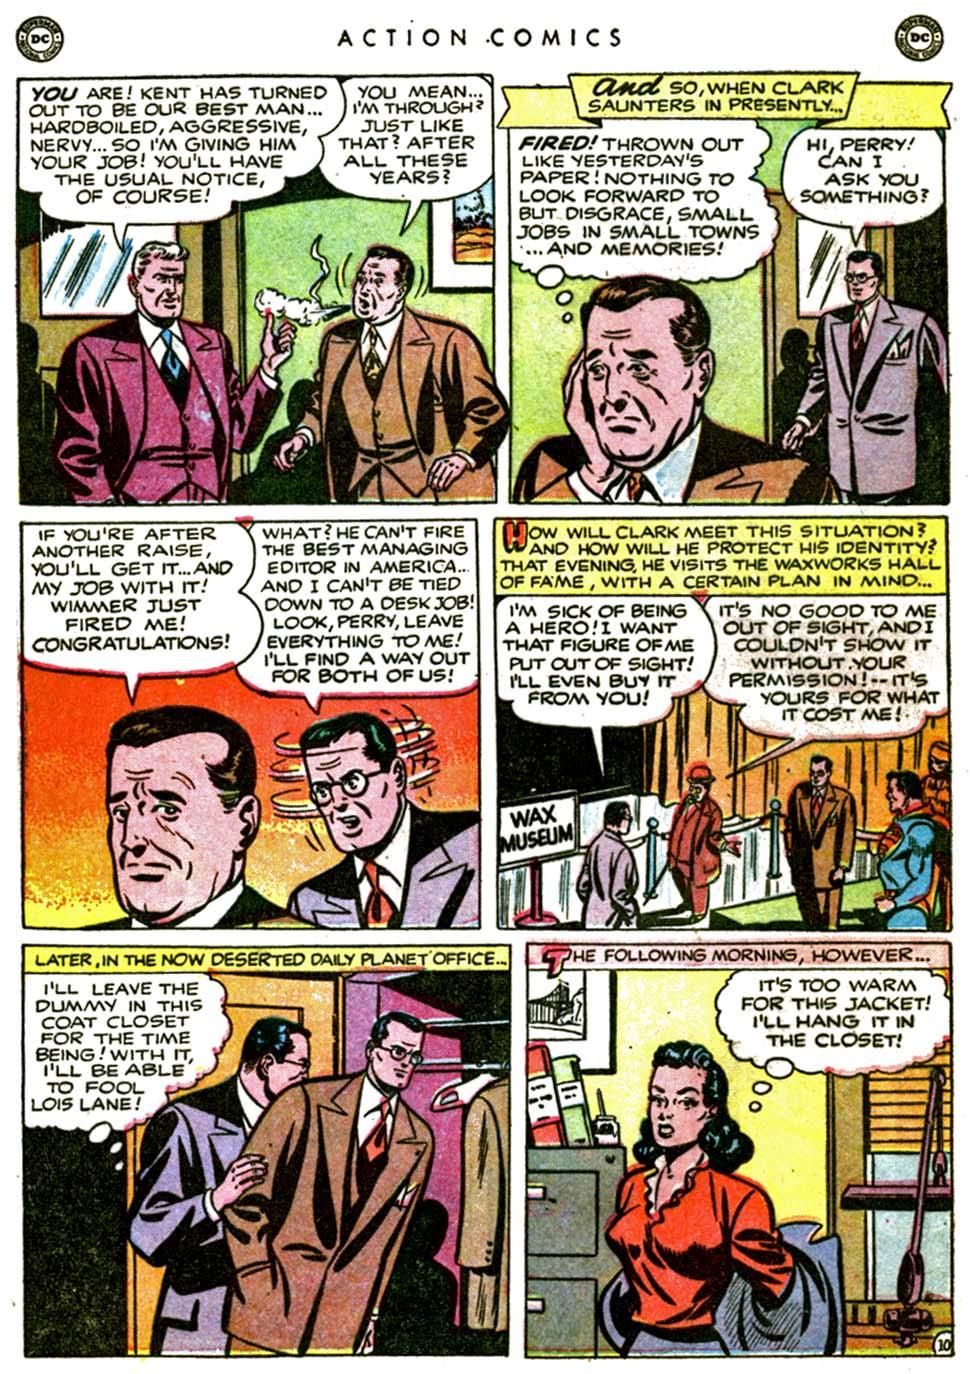 Action Comics (1938) 139 Page 11